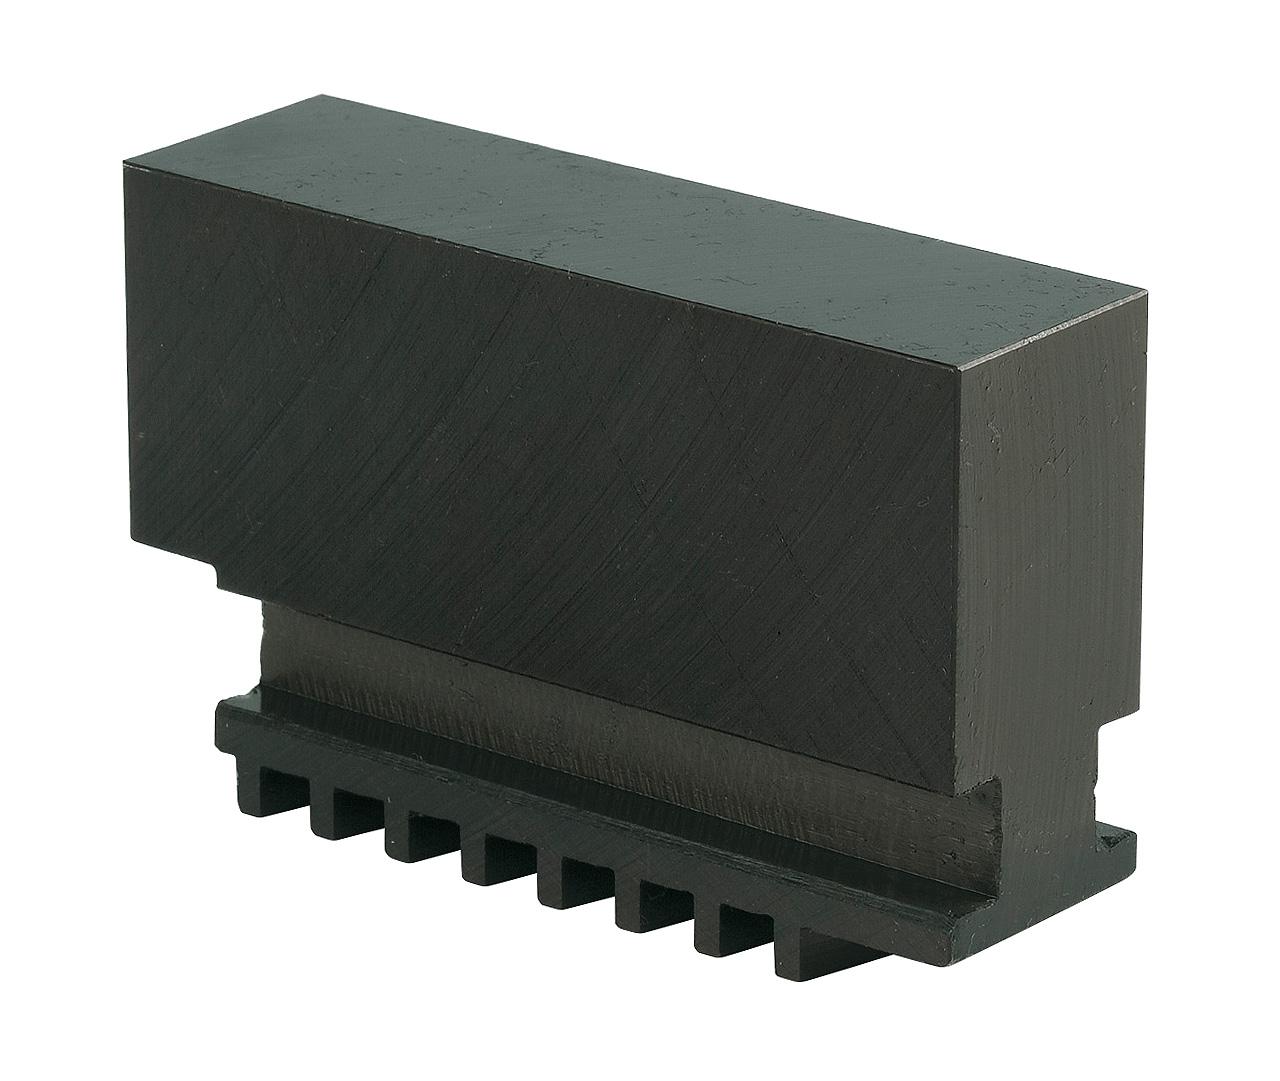 Szczęki jednolite miękkie - komplet DSJ-DK12-500 BERNARDO